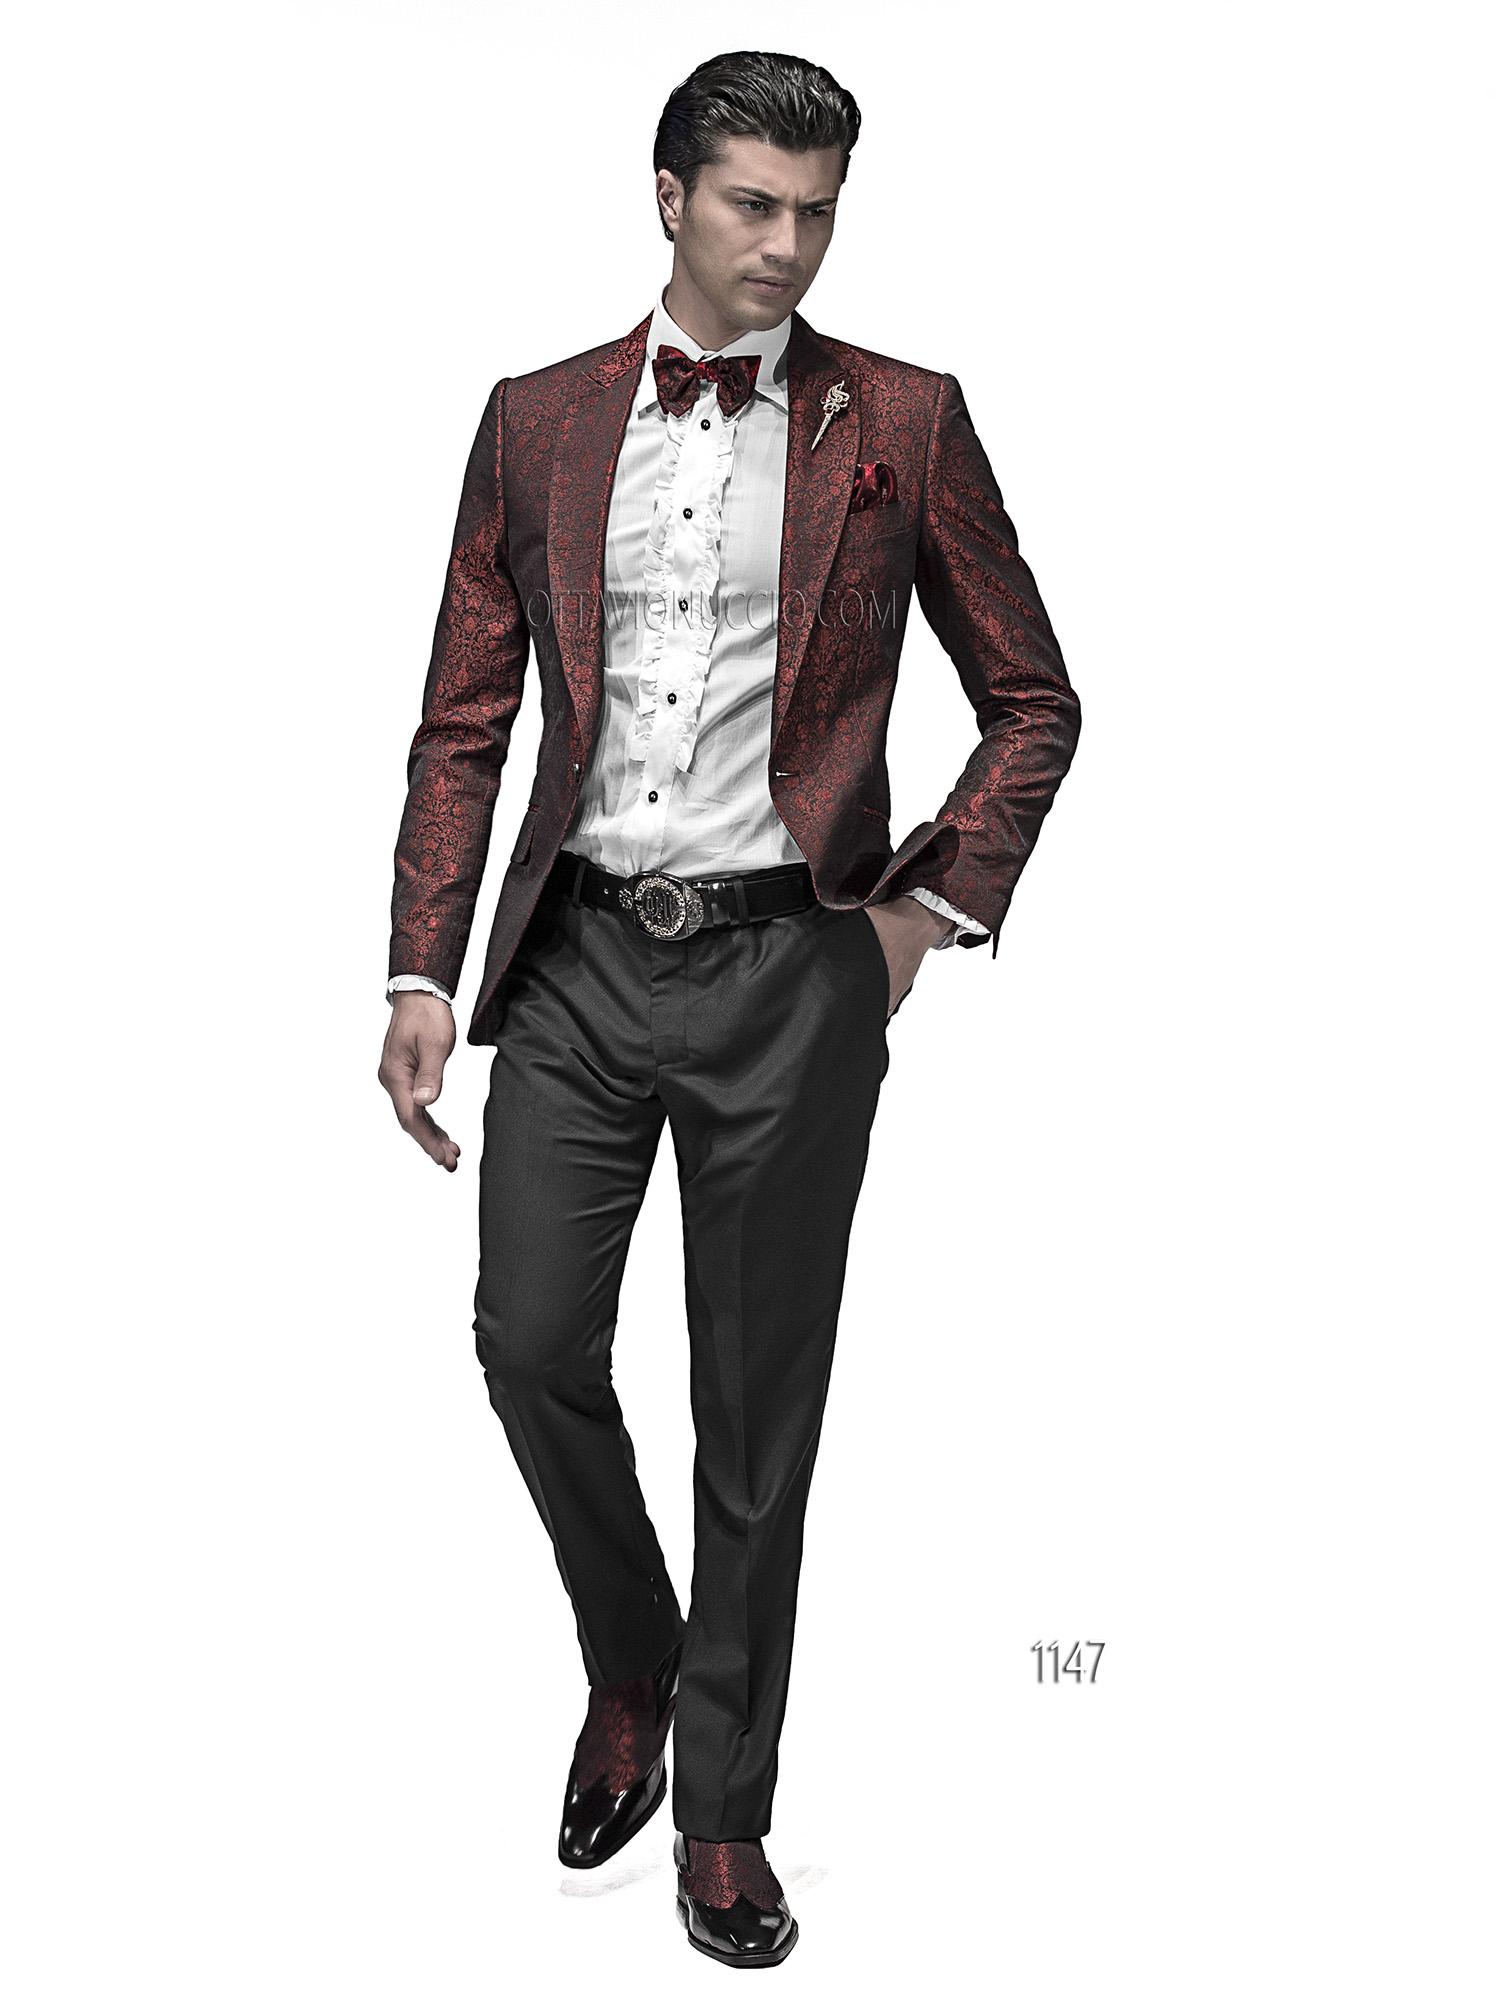 Vestito Matrimonio Uomo Vintage : Vestito nero matrimonio uomo su abiti da sposa italia